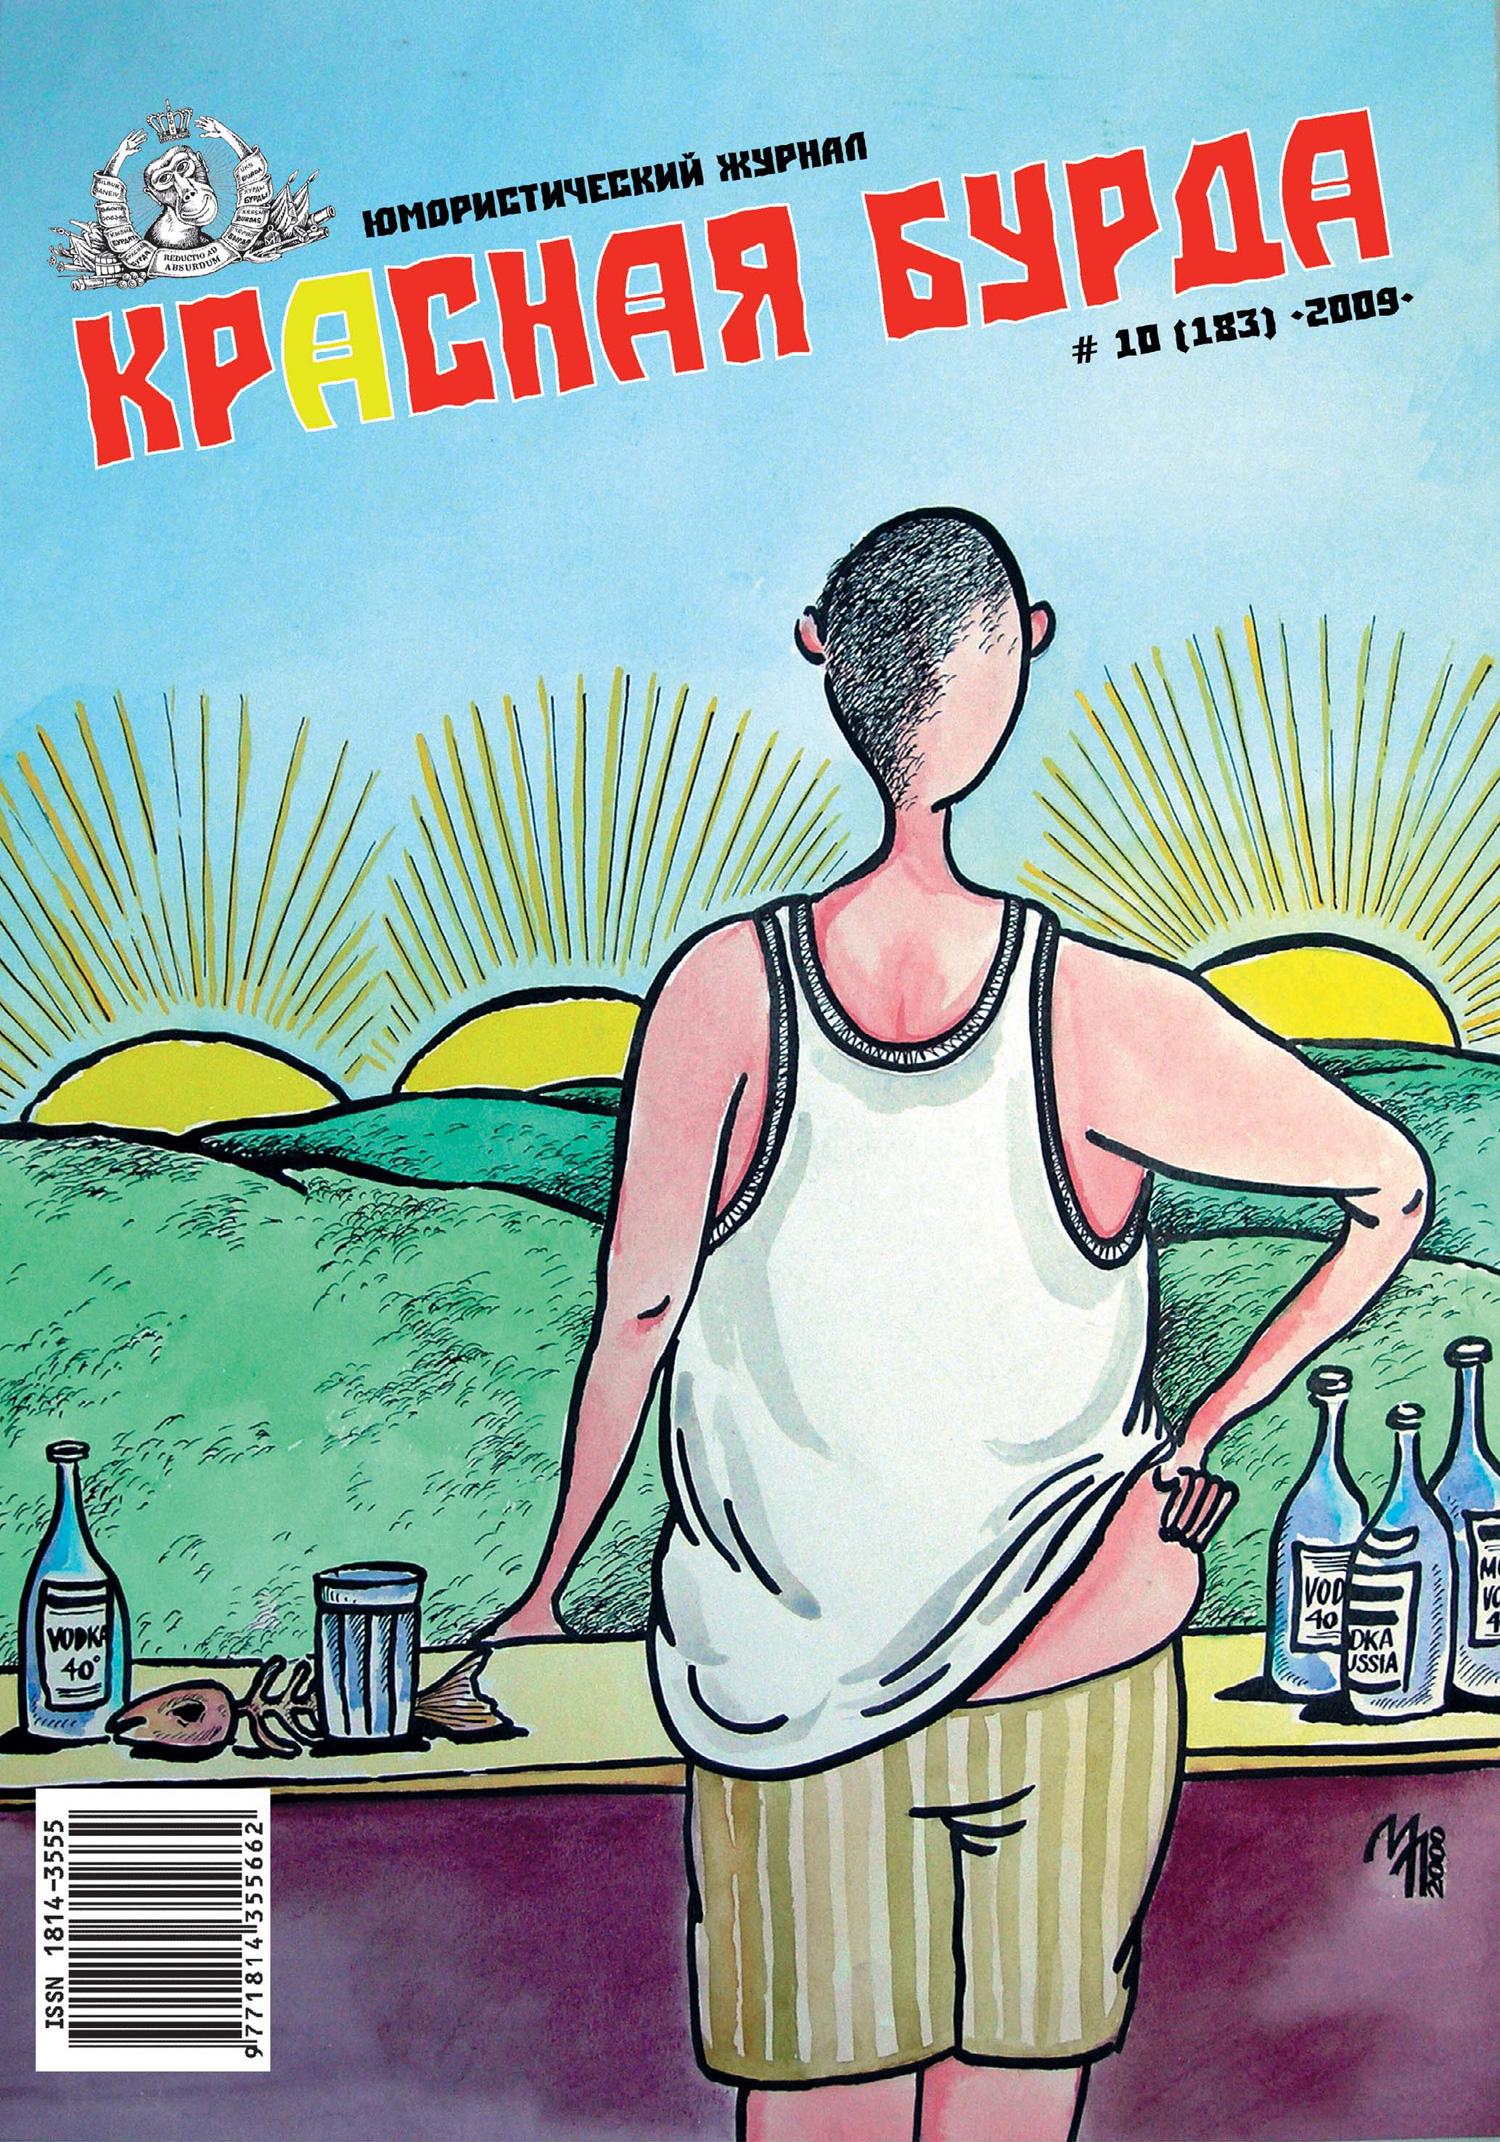 Красная бурда. Юмористический журнал №10 (183) 2009